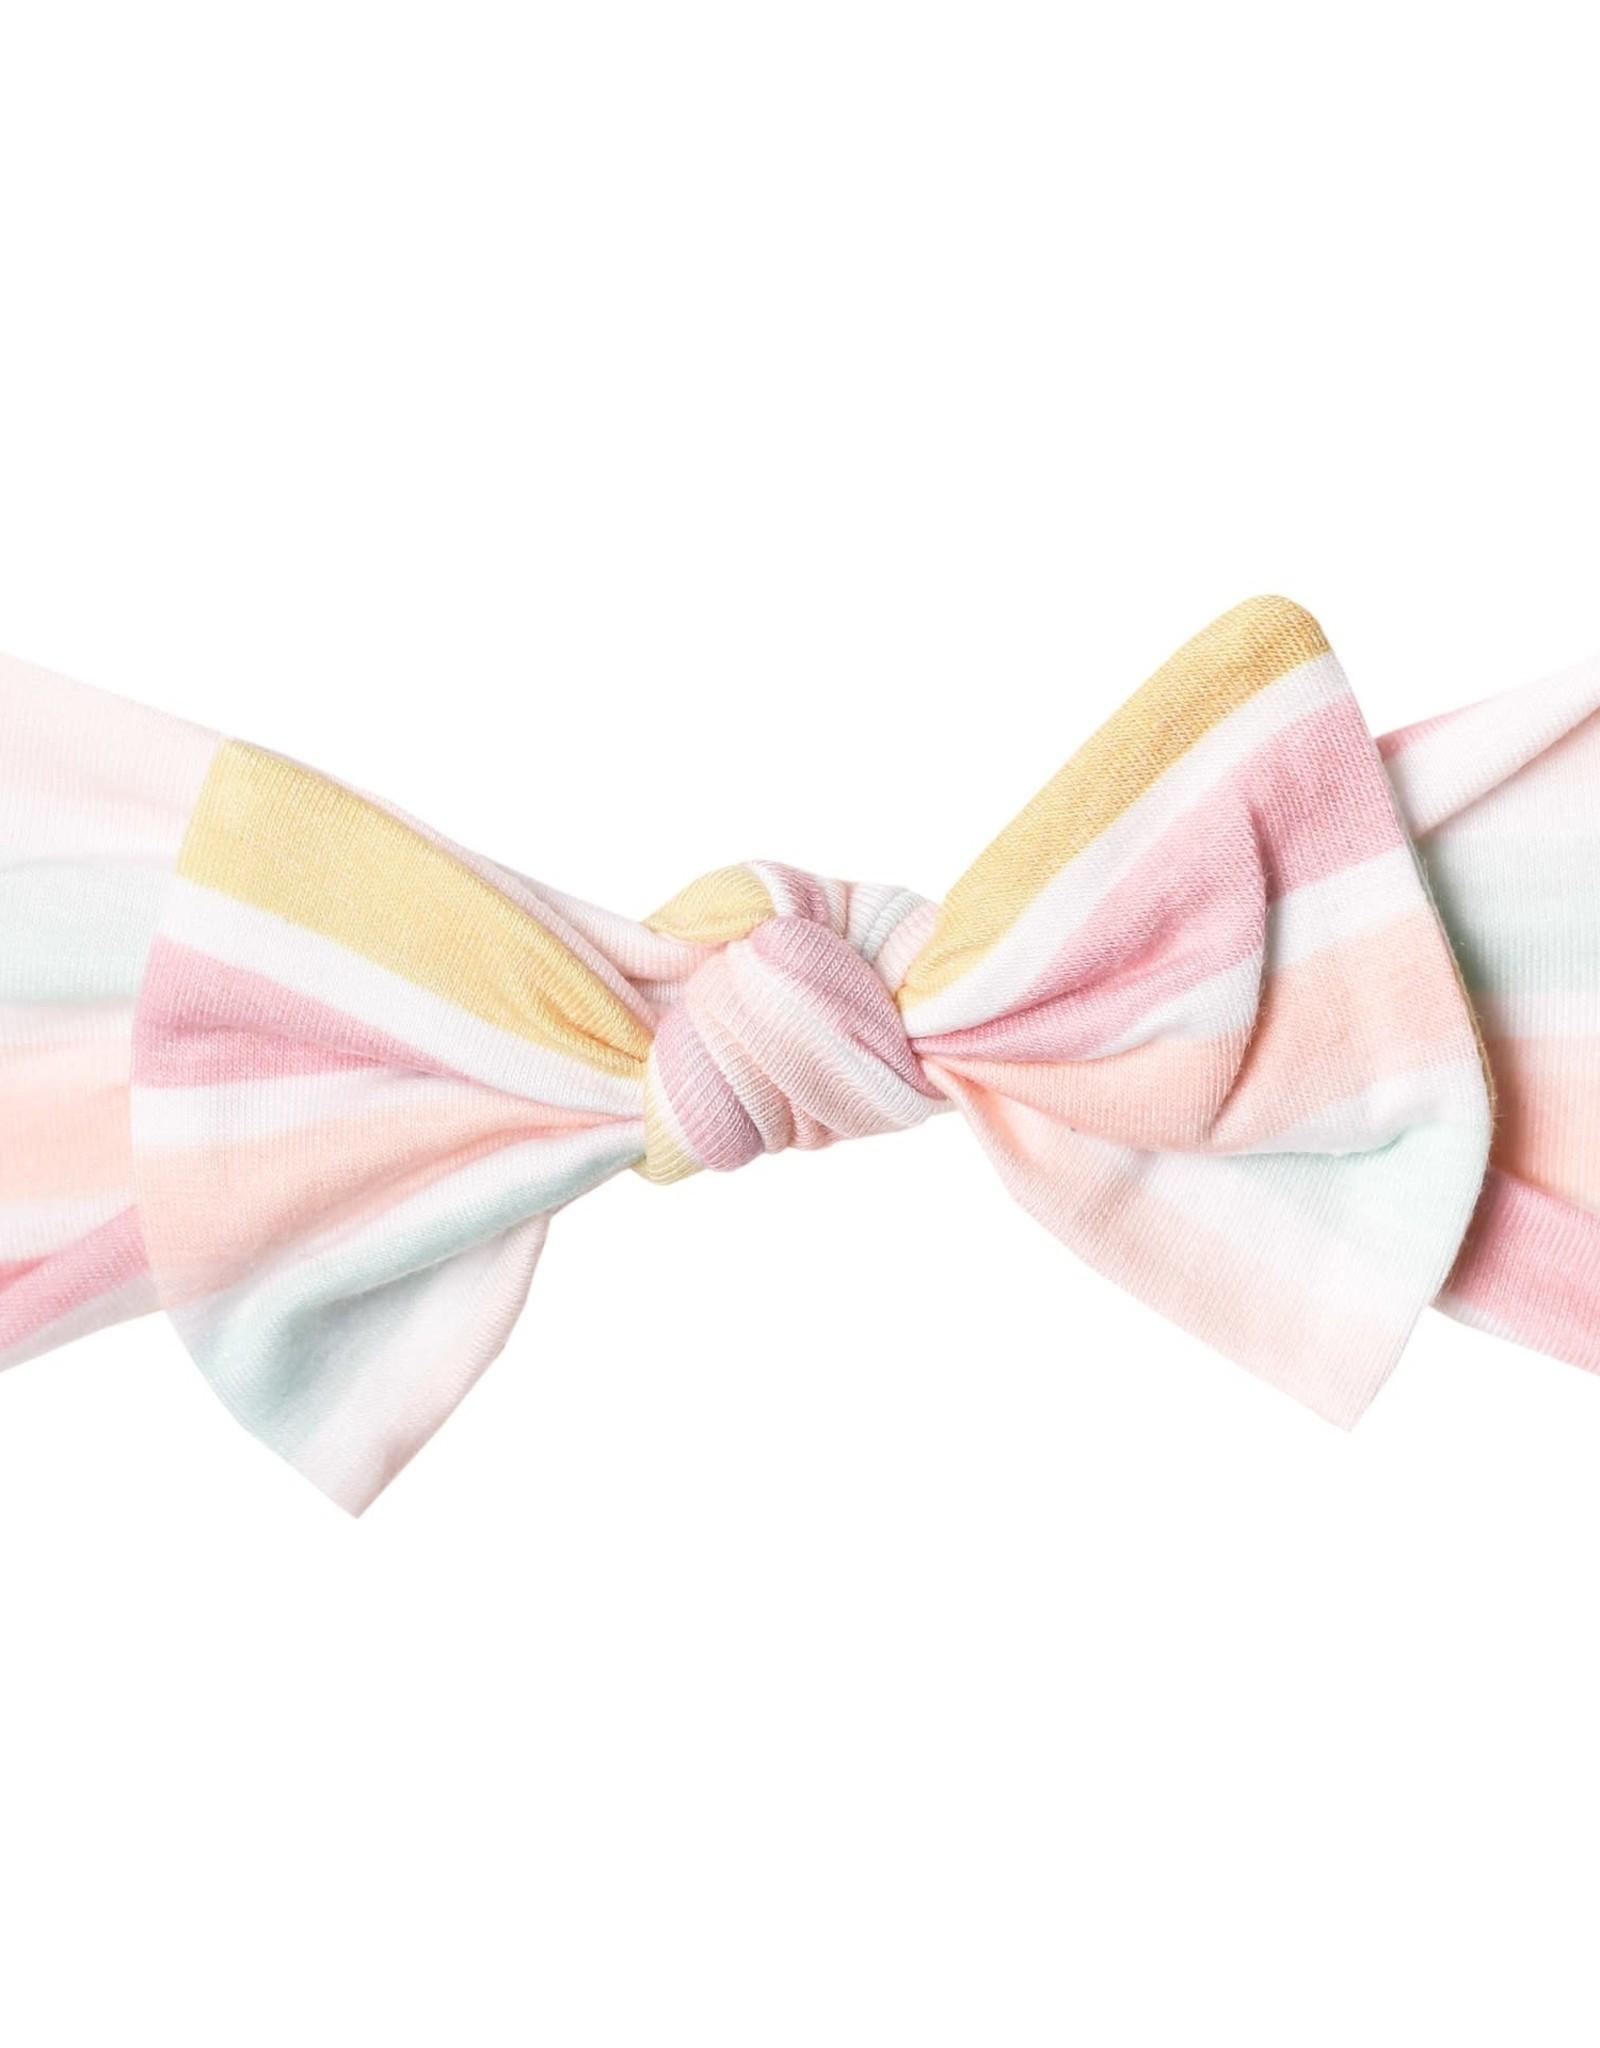 Copper Pearl Knit Headband Bow Belle